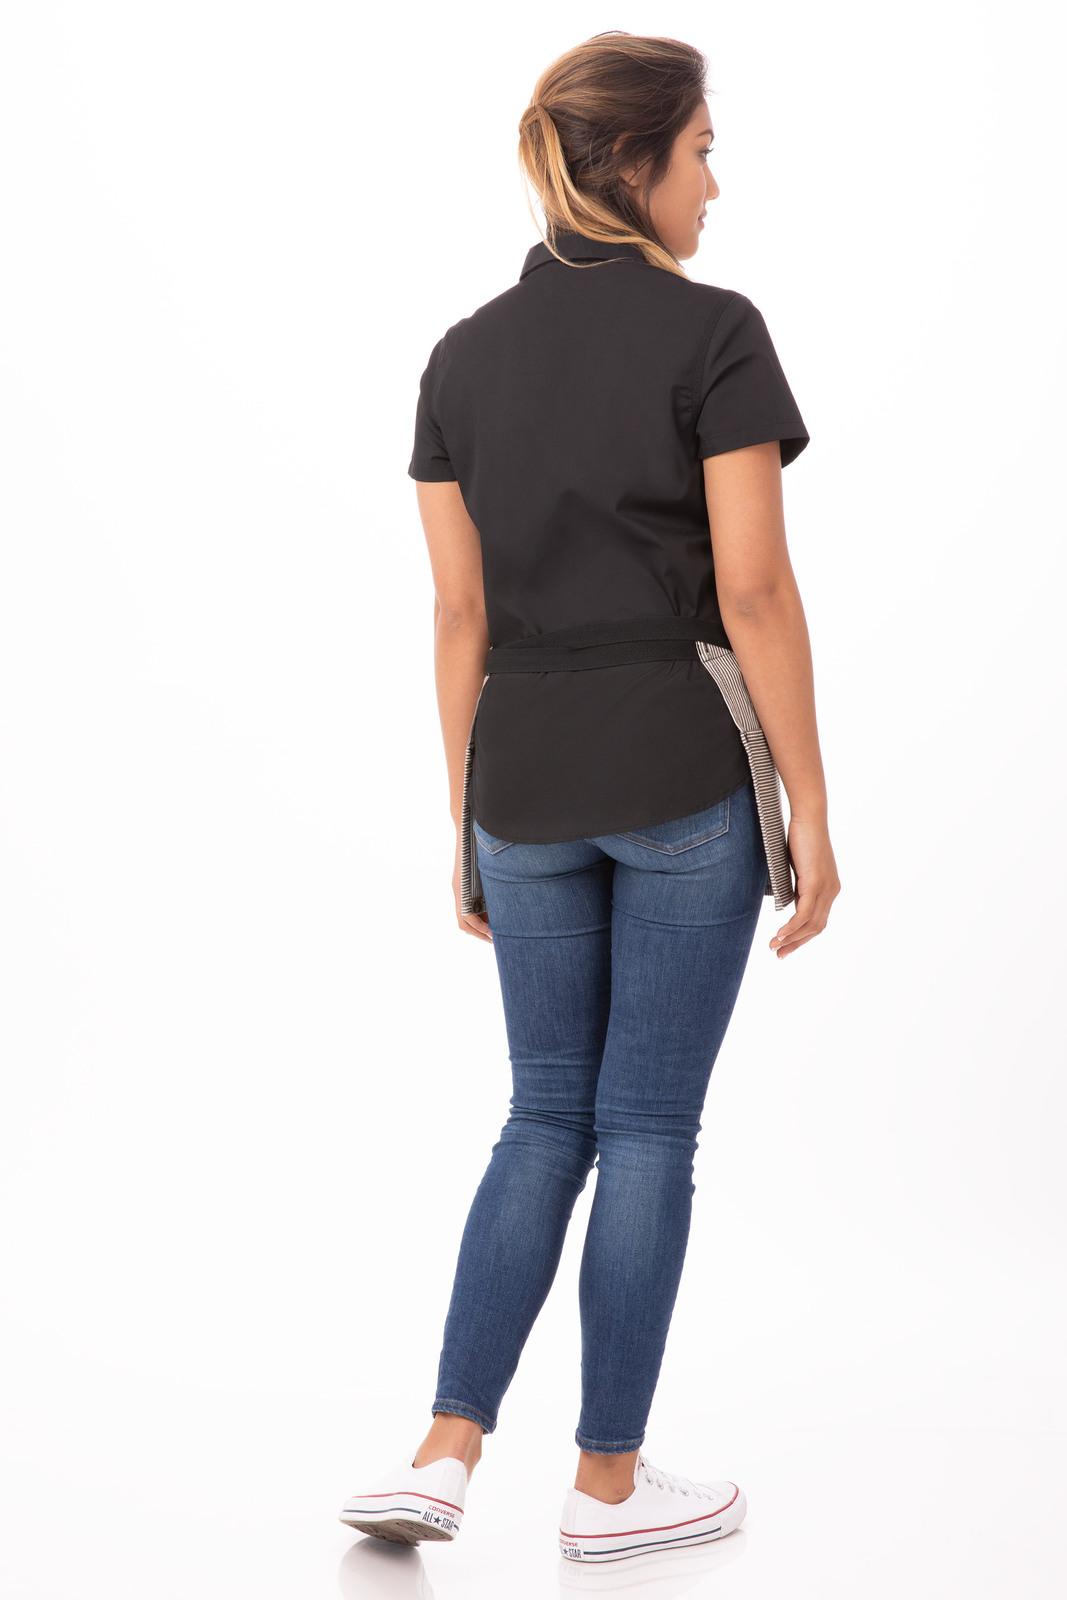 White denim apron - Portland Black Denim Short Waist Apron